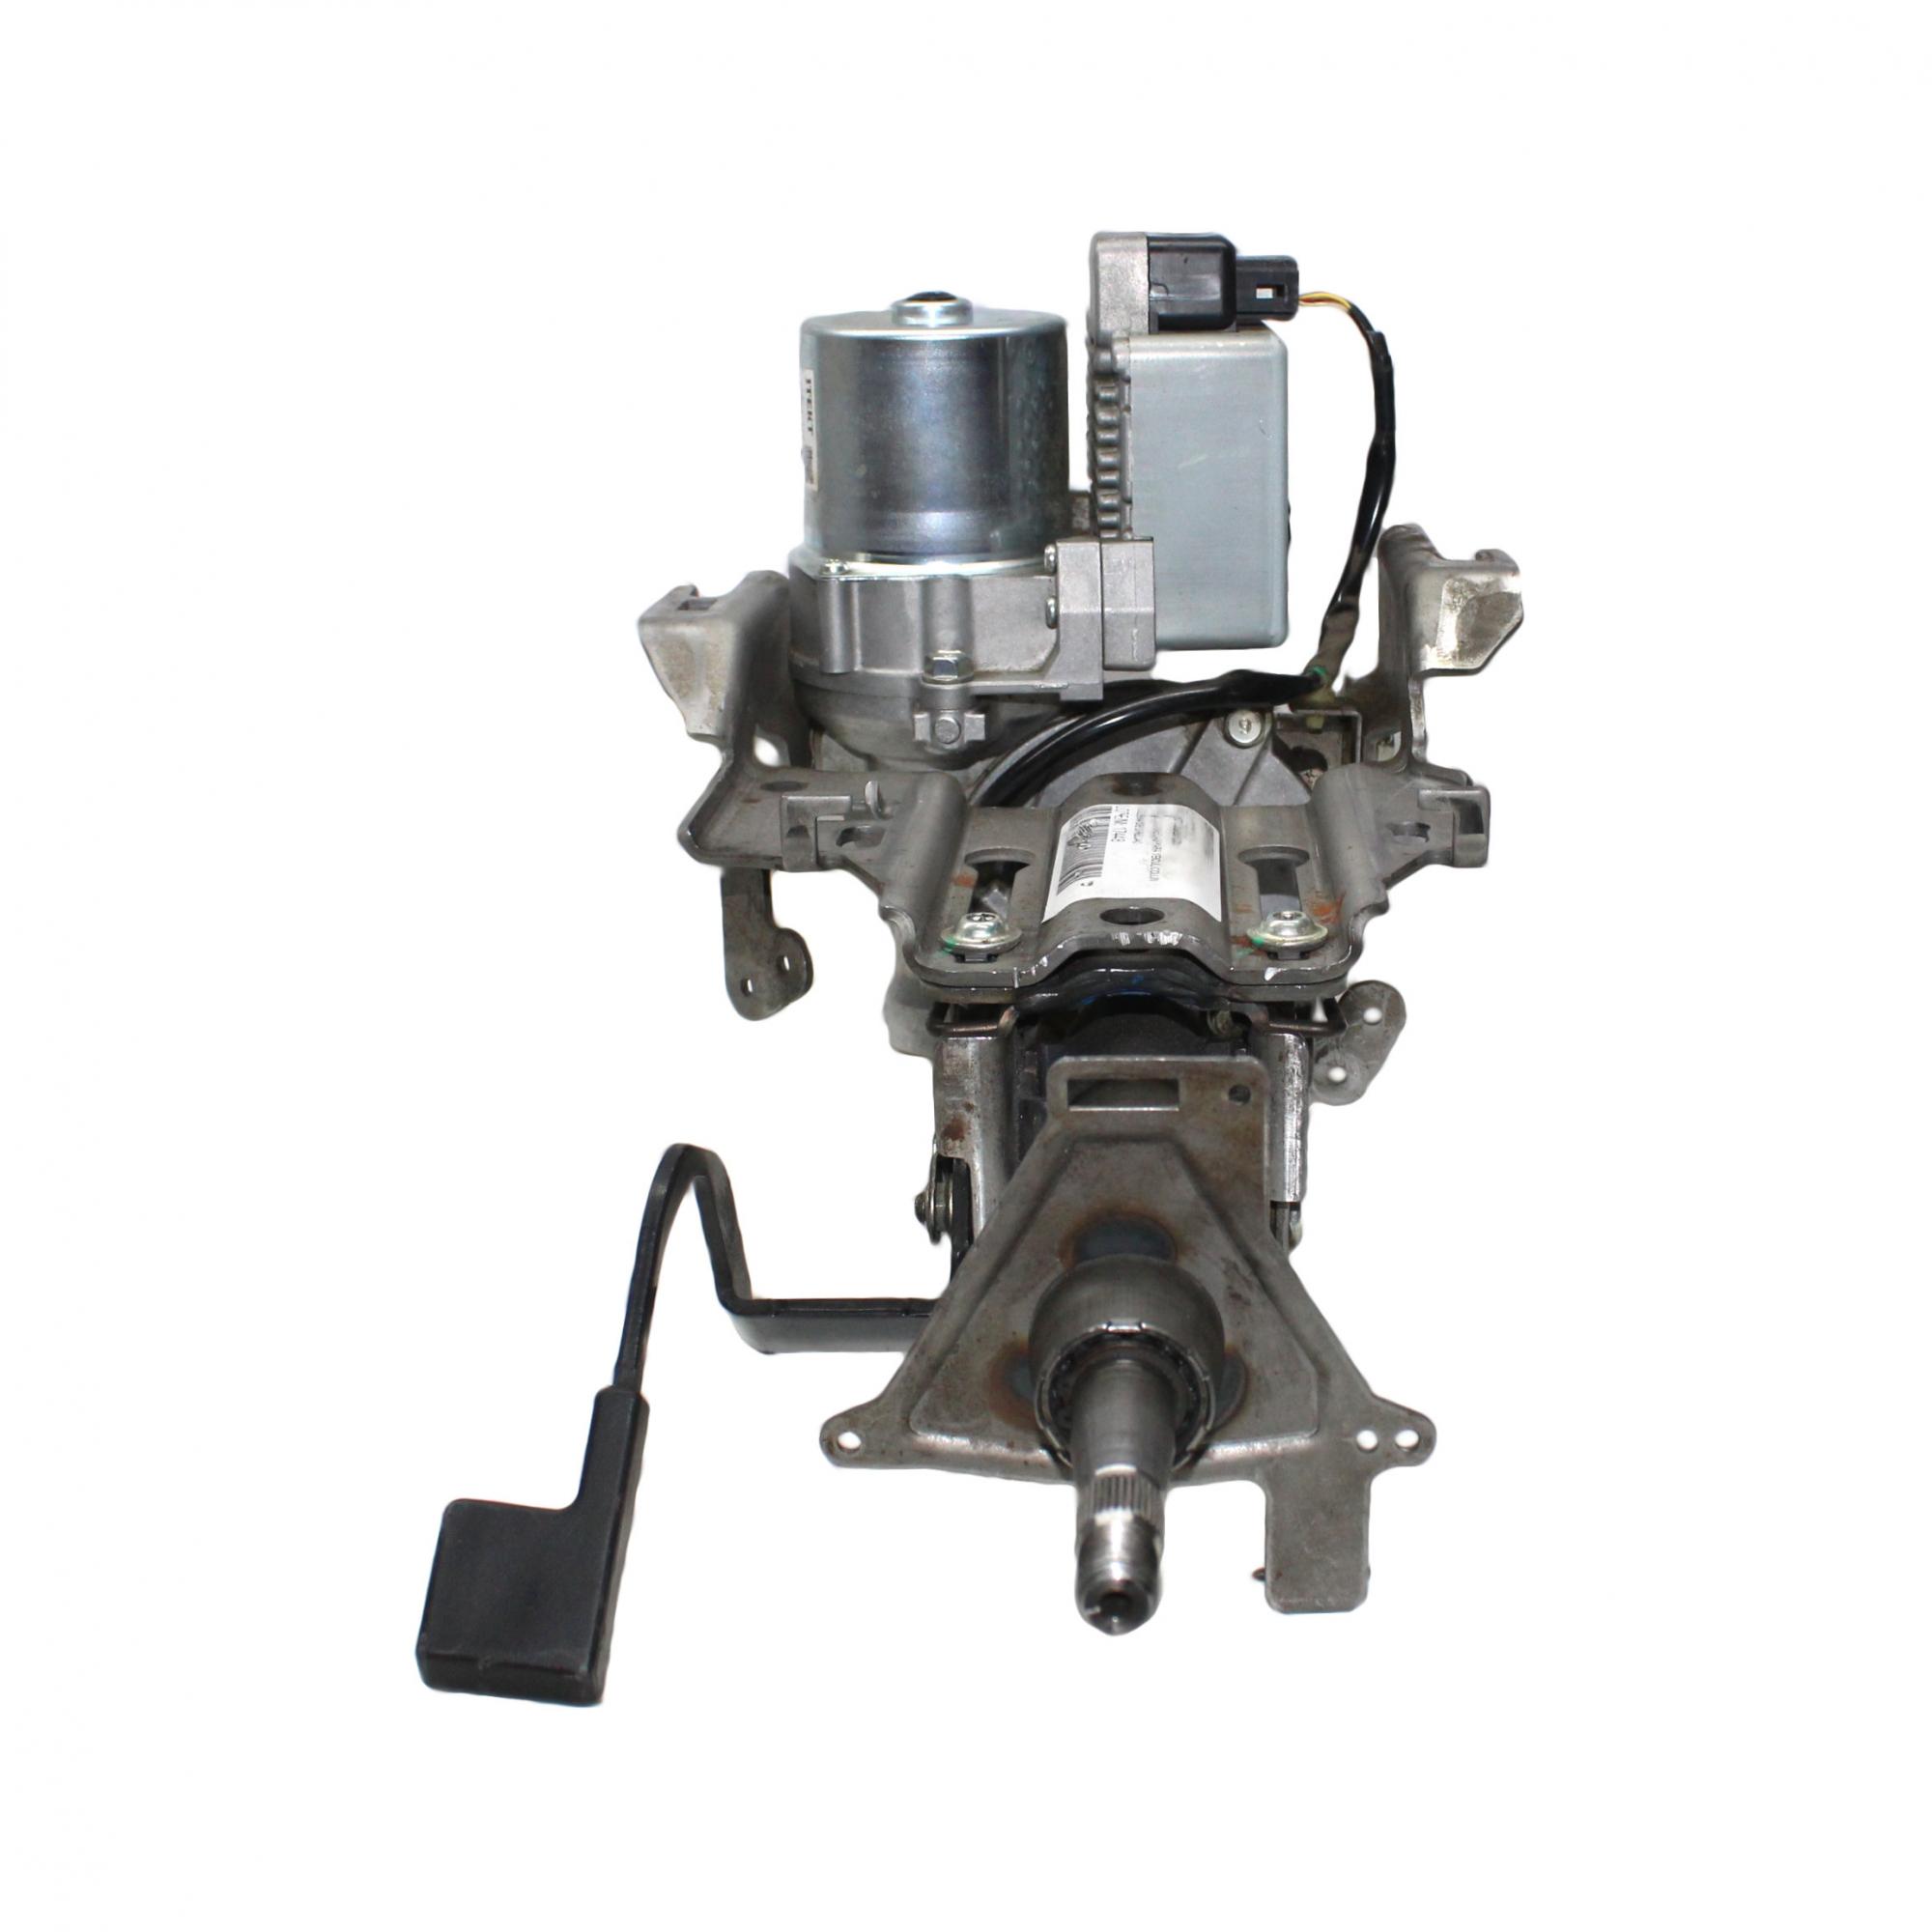 Motor Coluna Direção Elétrica JTEKT Nissan Sentra 2007...2013